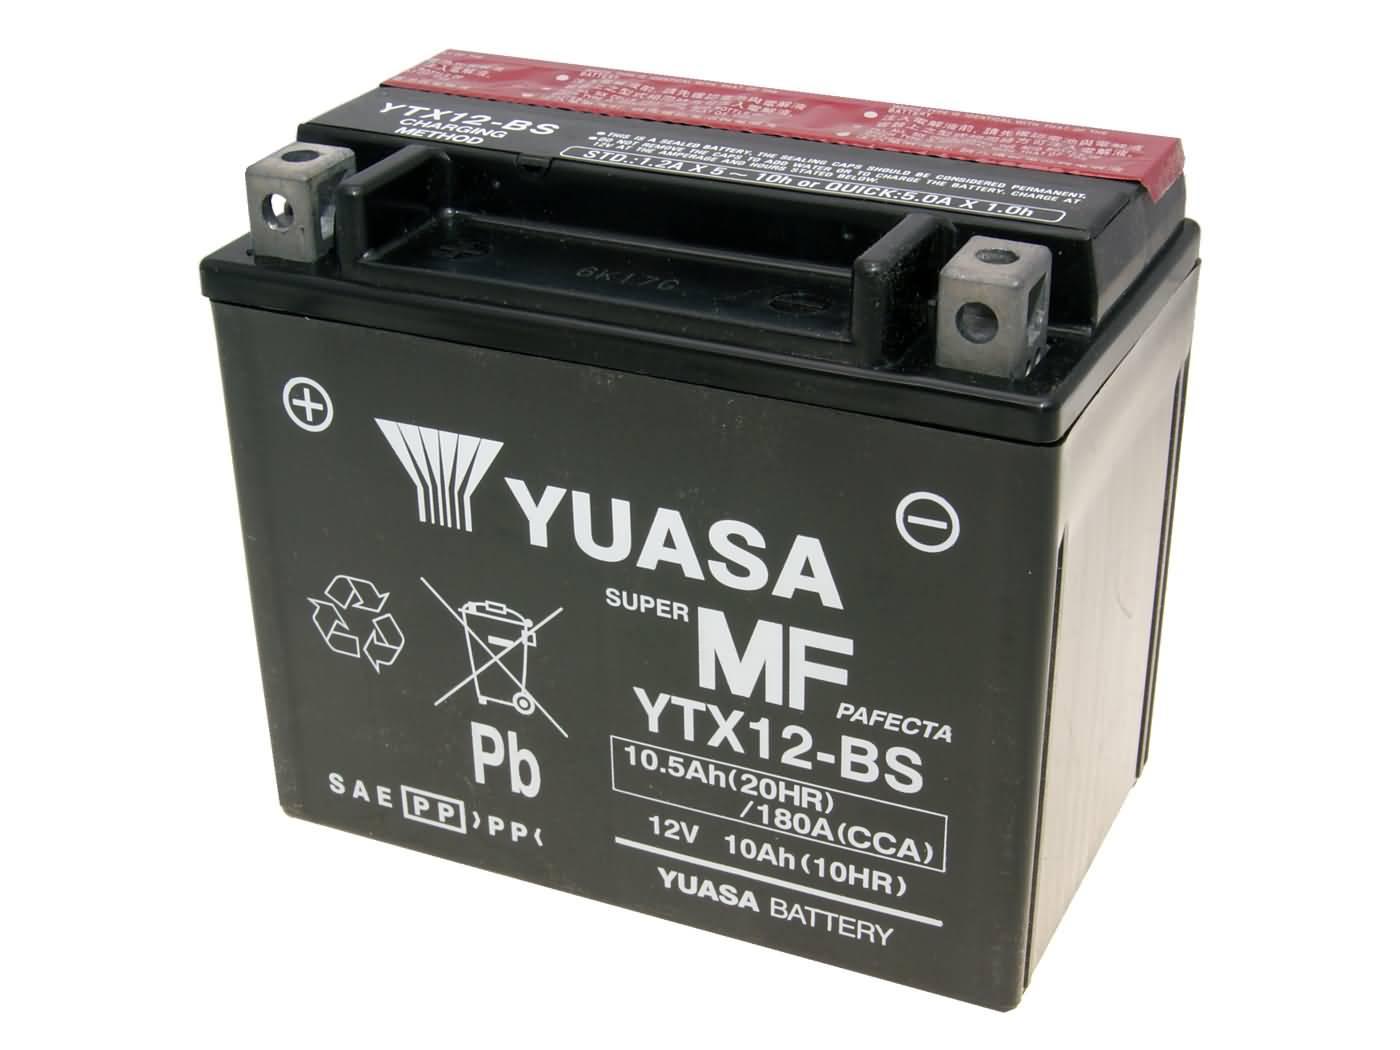 batterie yuasa ytx12 bs dry mf wartungsfrei roller. Black Bedroom Furniture Sets. Home Design Ideas